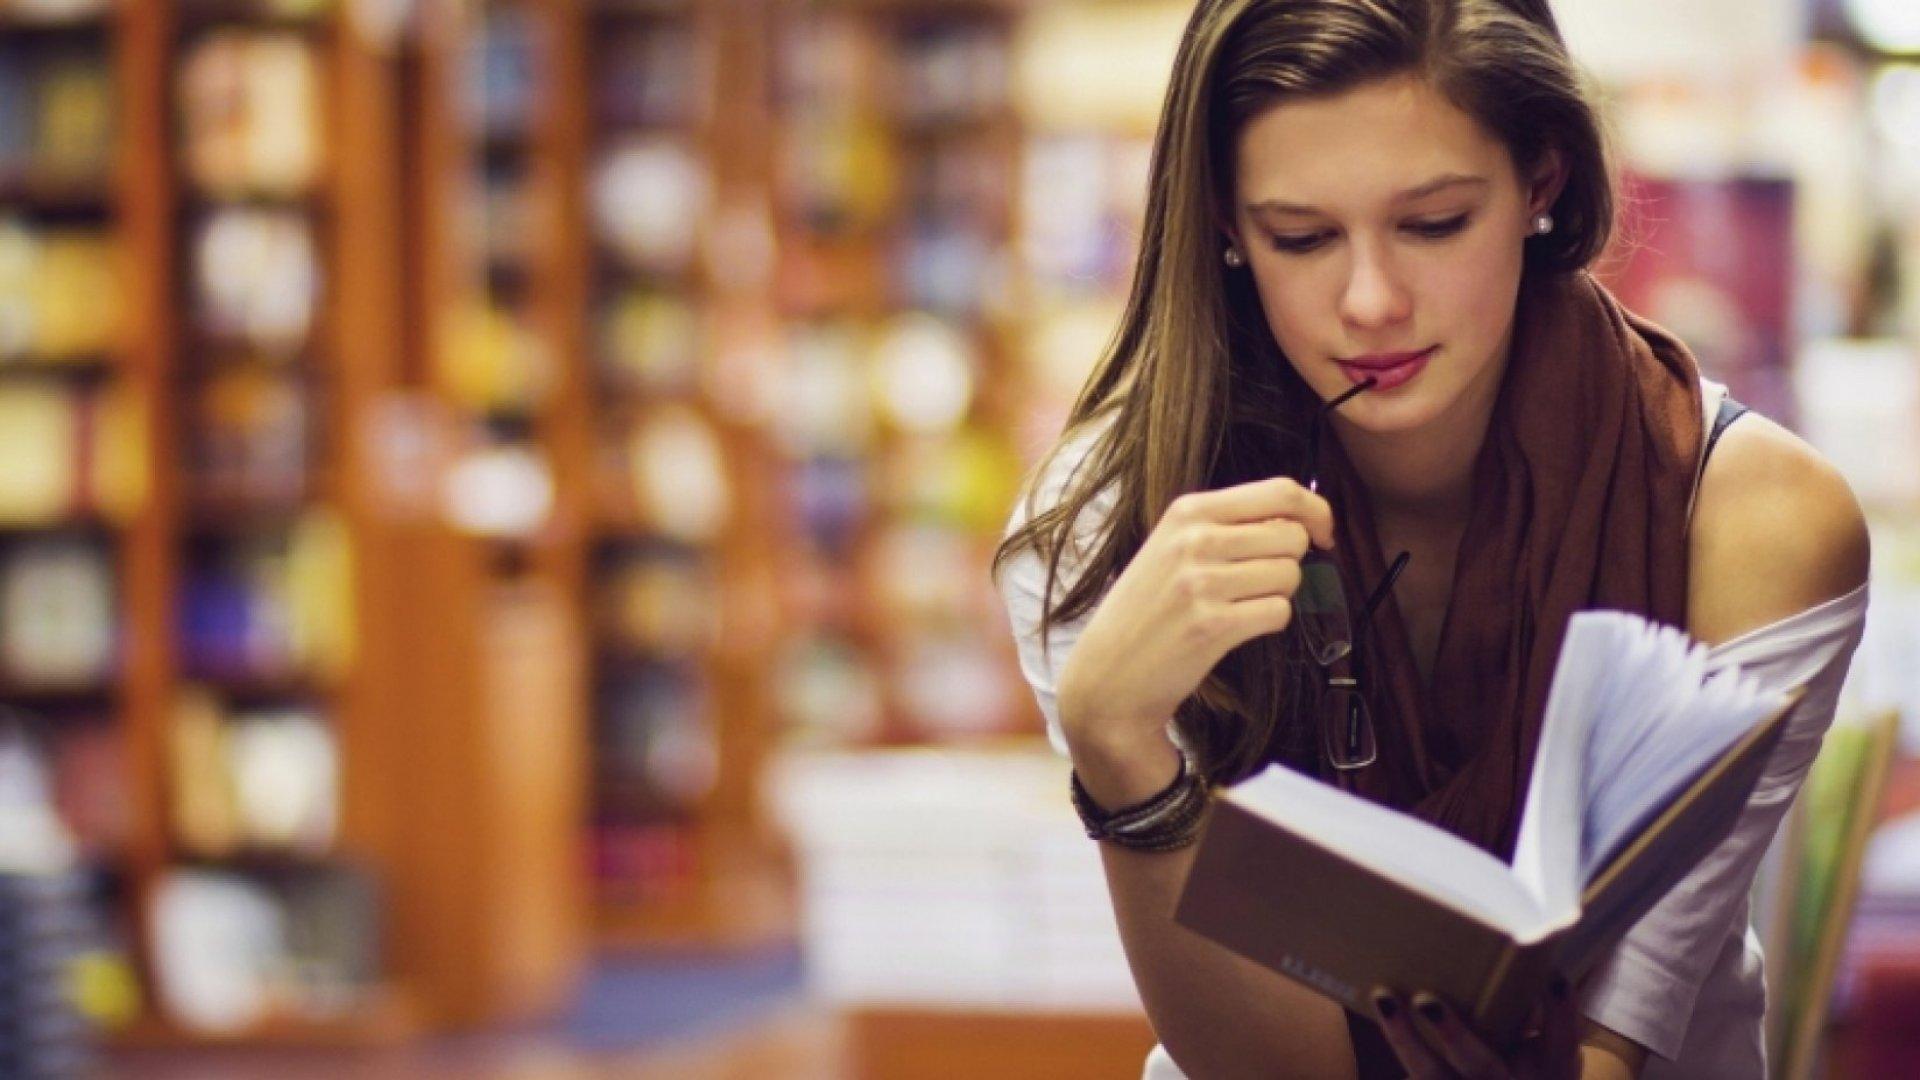 5 Inspiring Business Biographies Every Entrepreneur Should Read